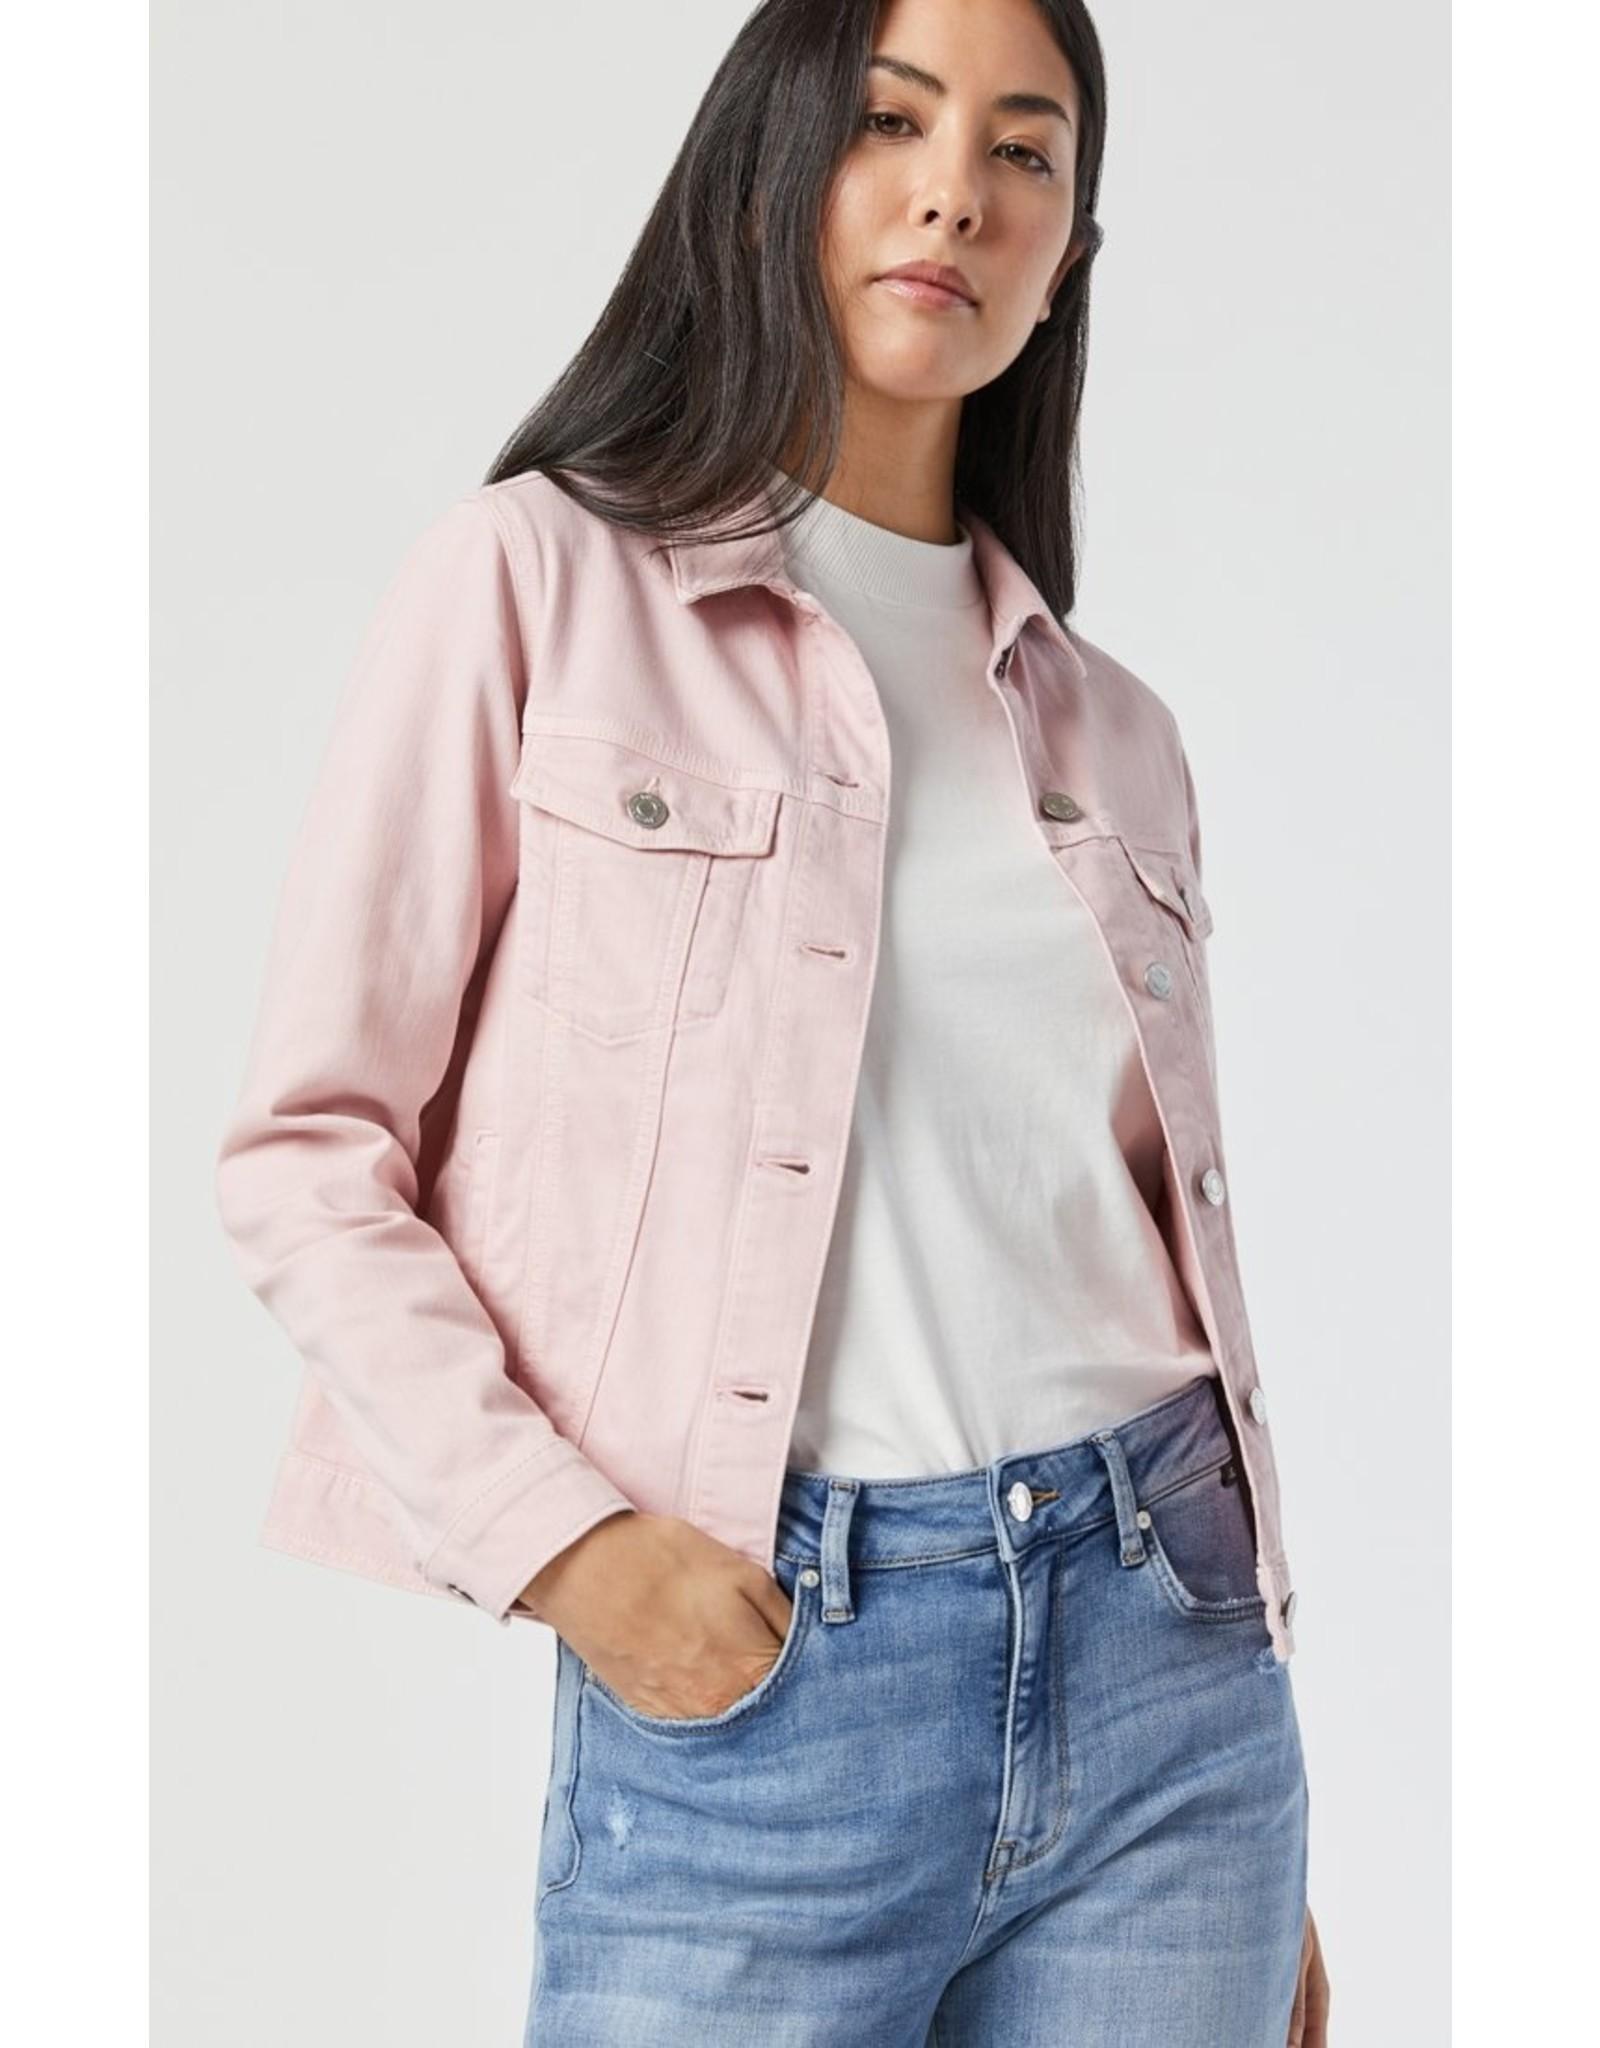 Mavi Katy Burnished Denim Jacket